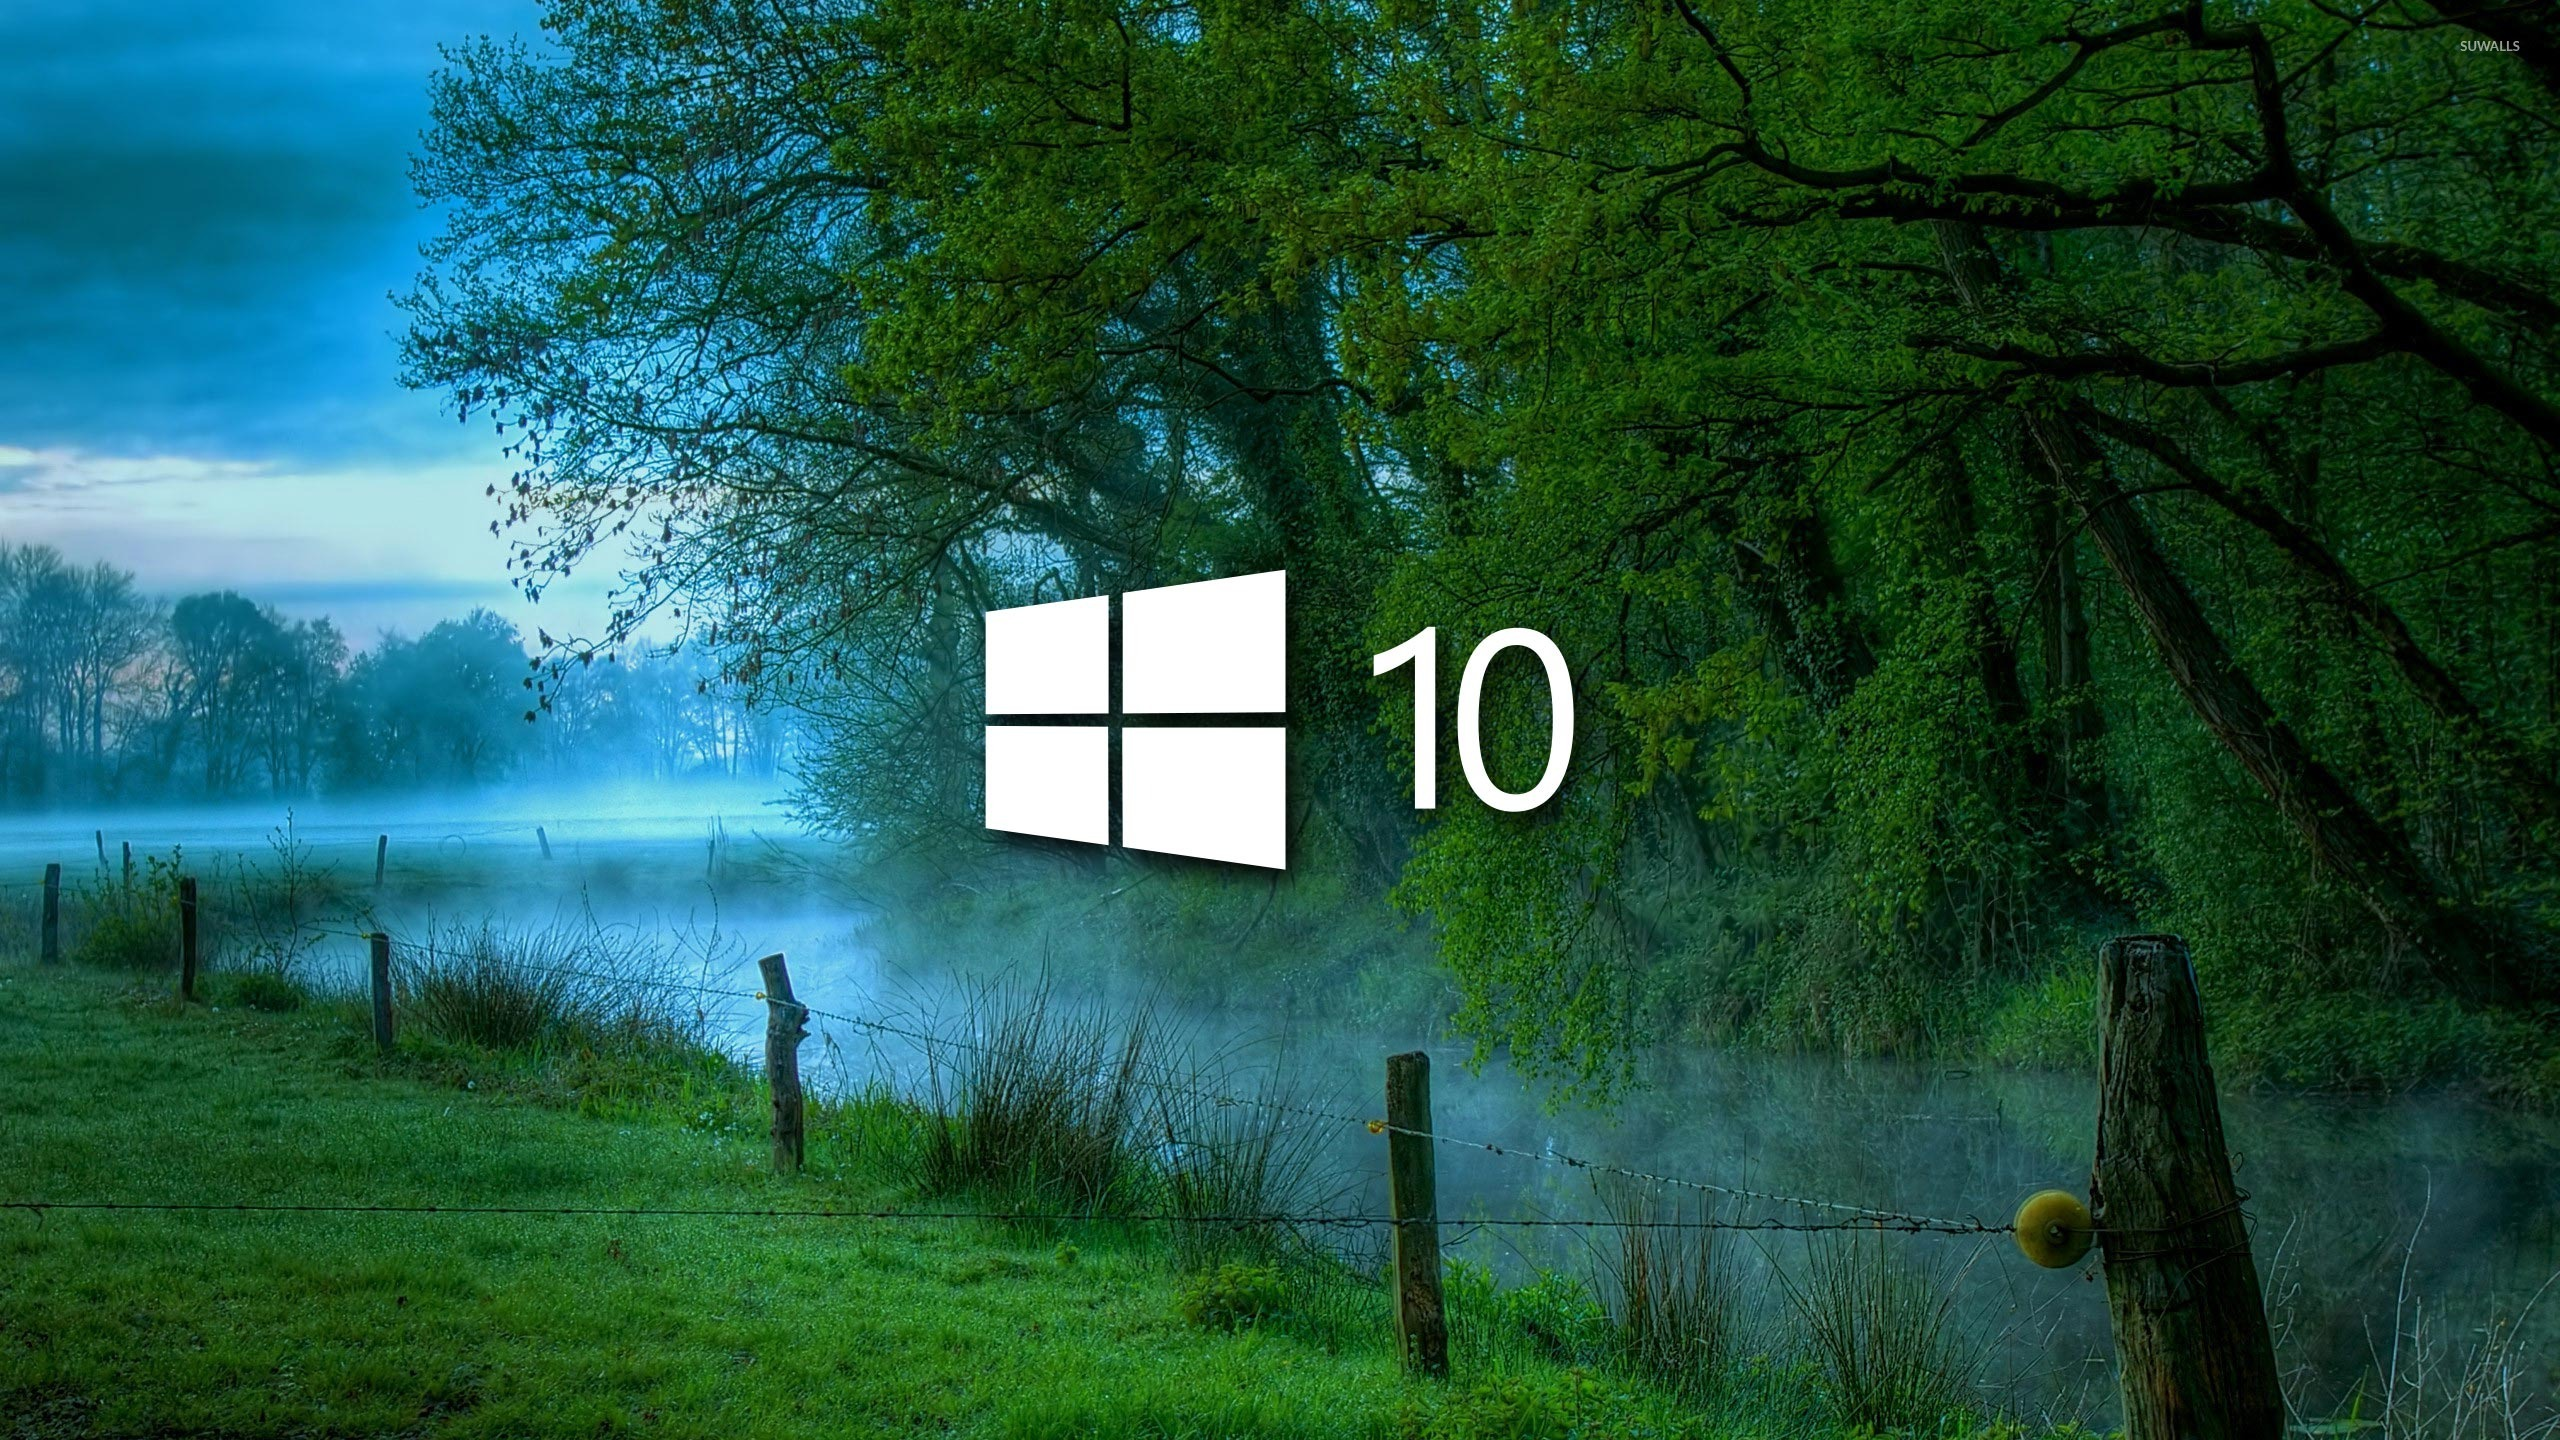 Windows 10 Desktop Background HD 2560x1440 | deskbg.com